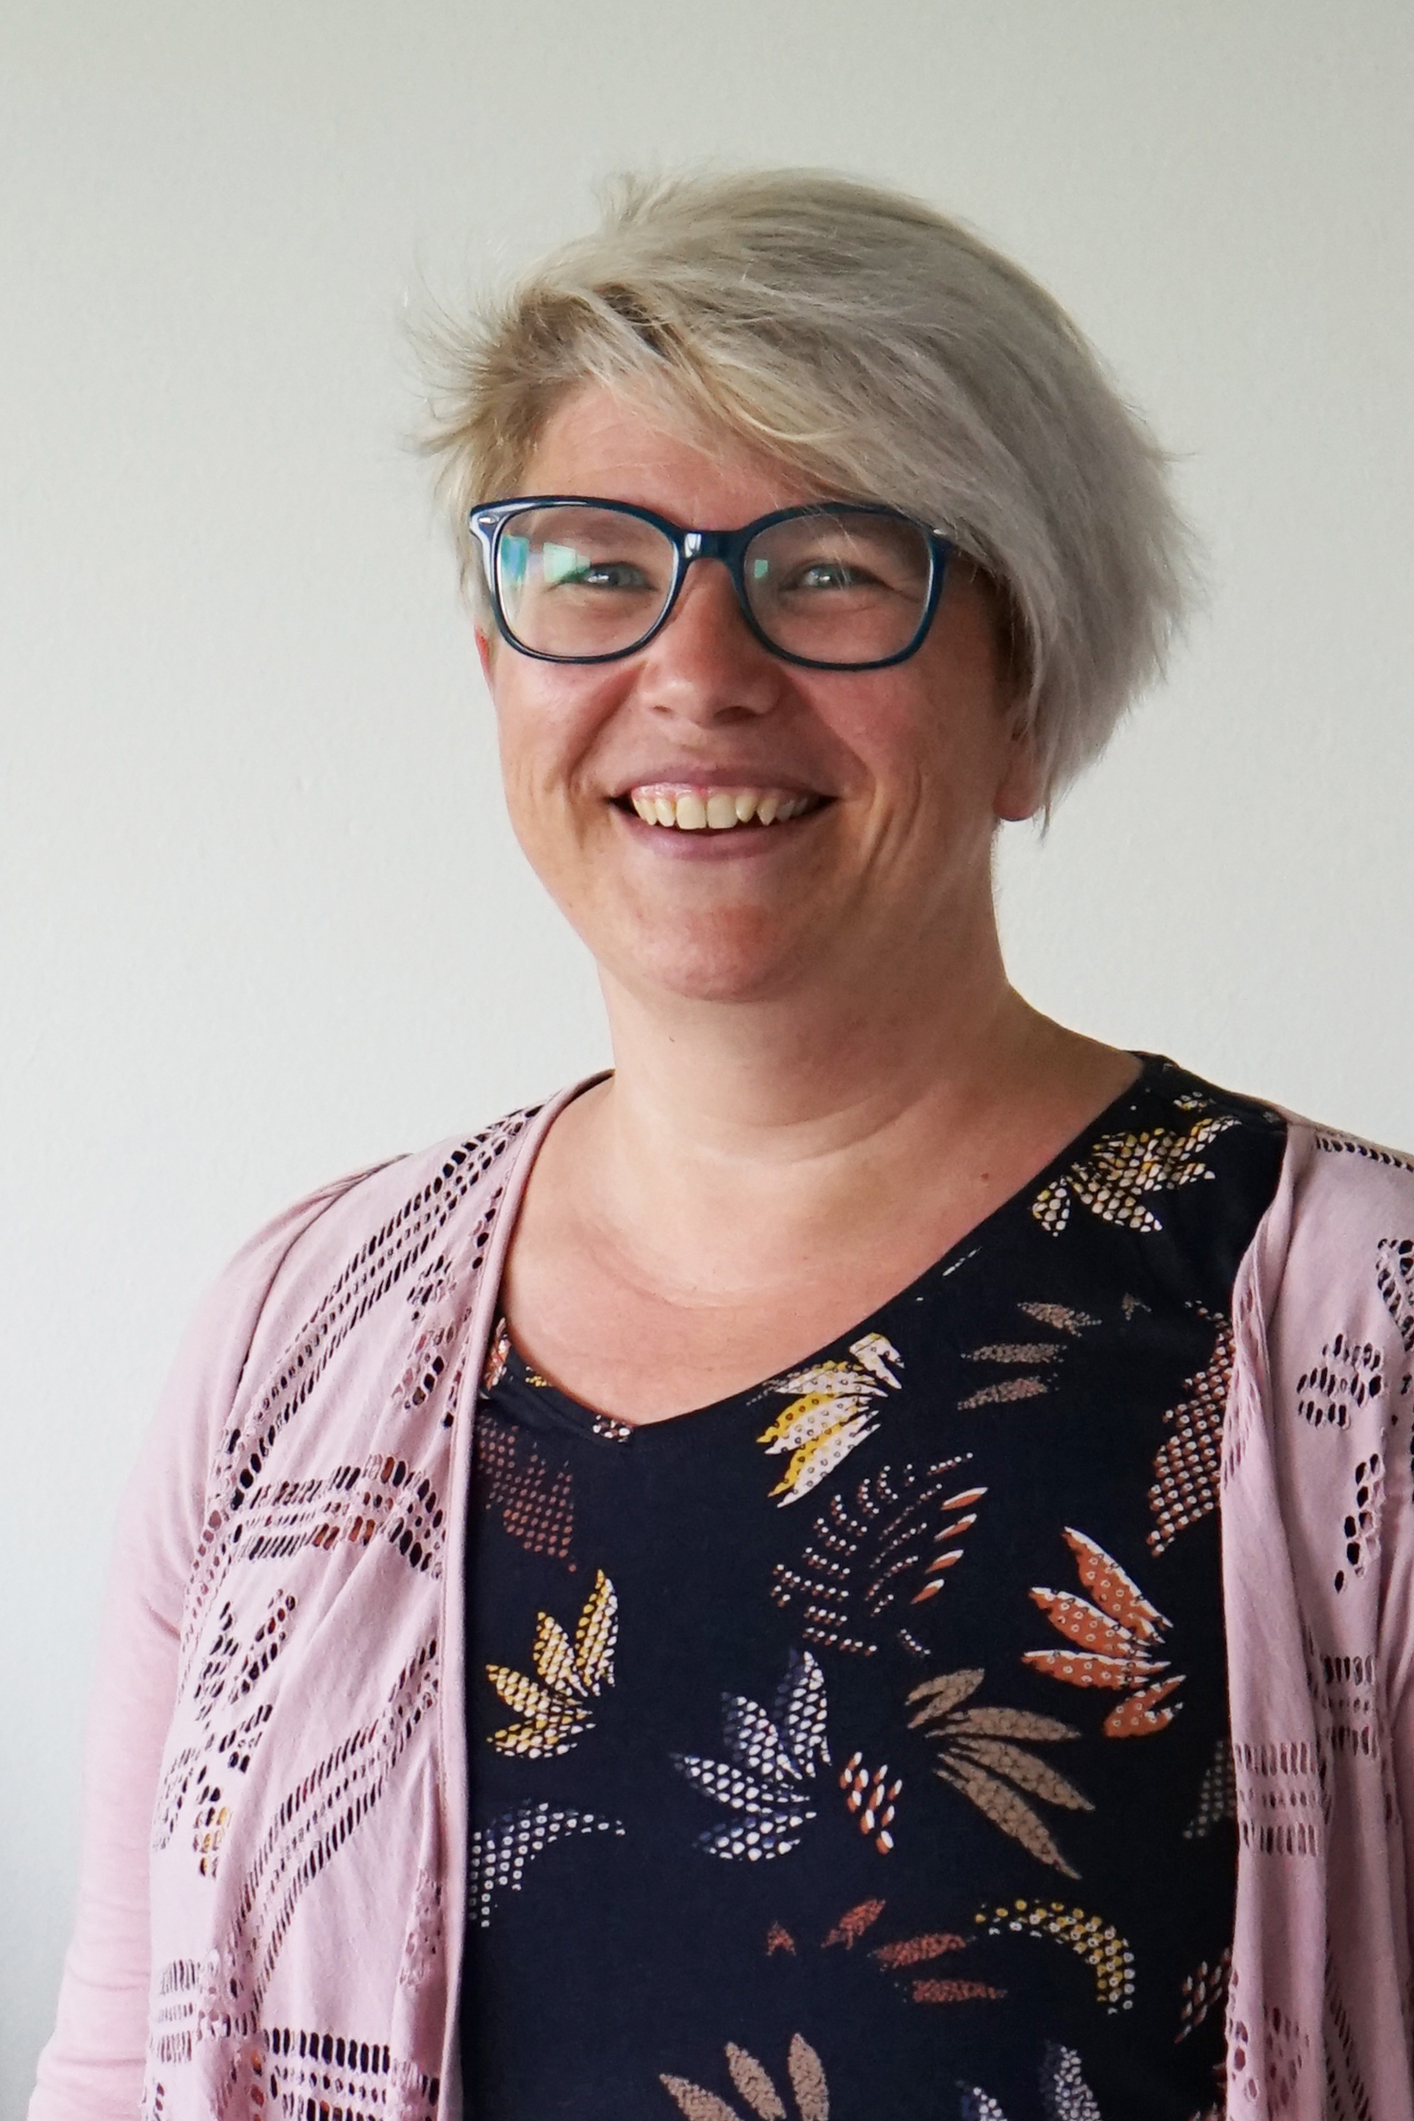 Astrid Habraken